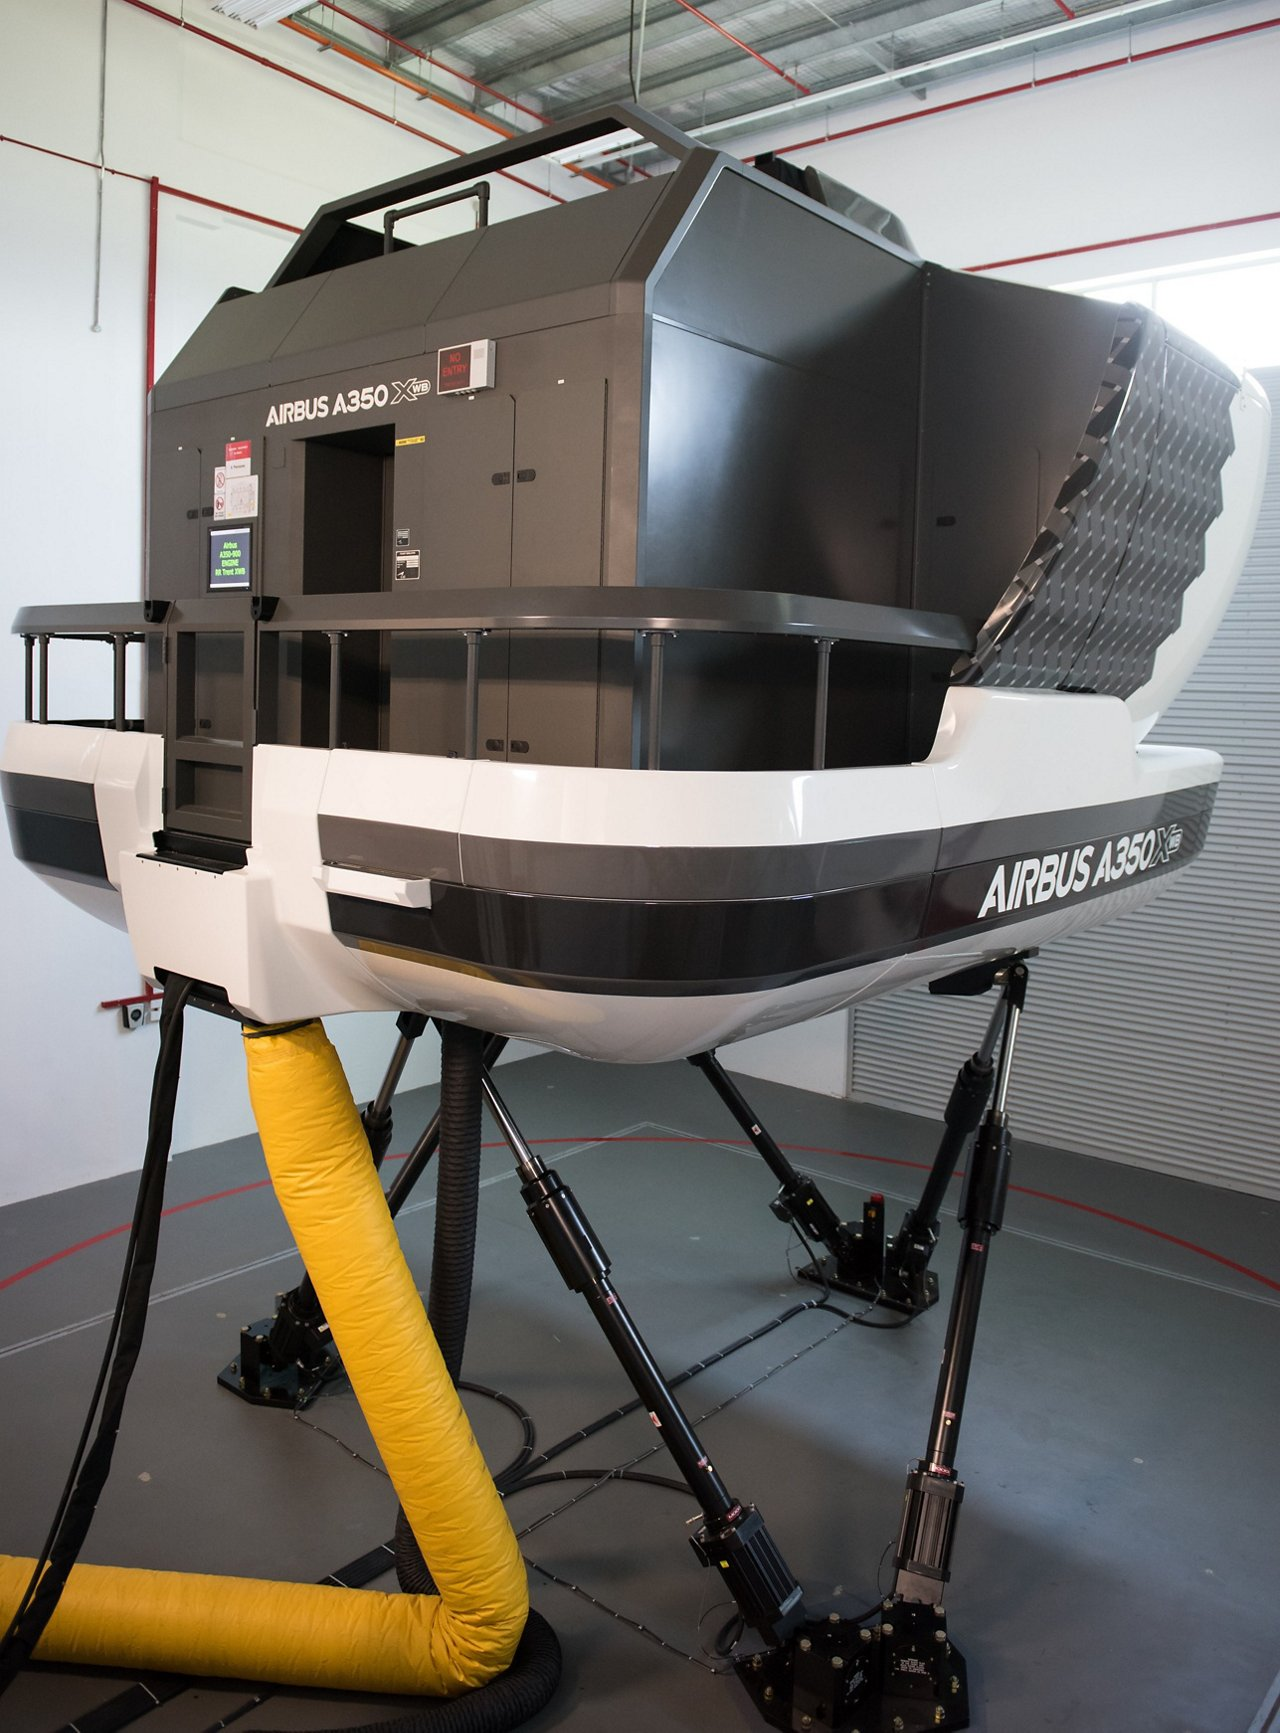 AATC A350 XWB full flight simulator